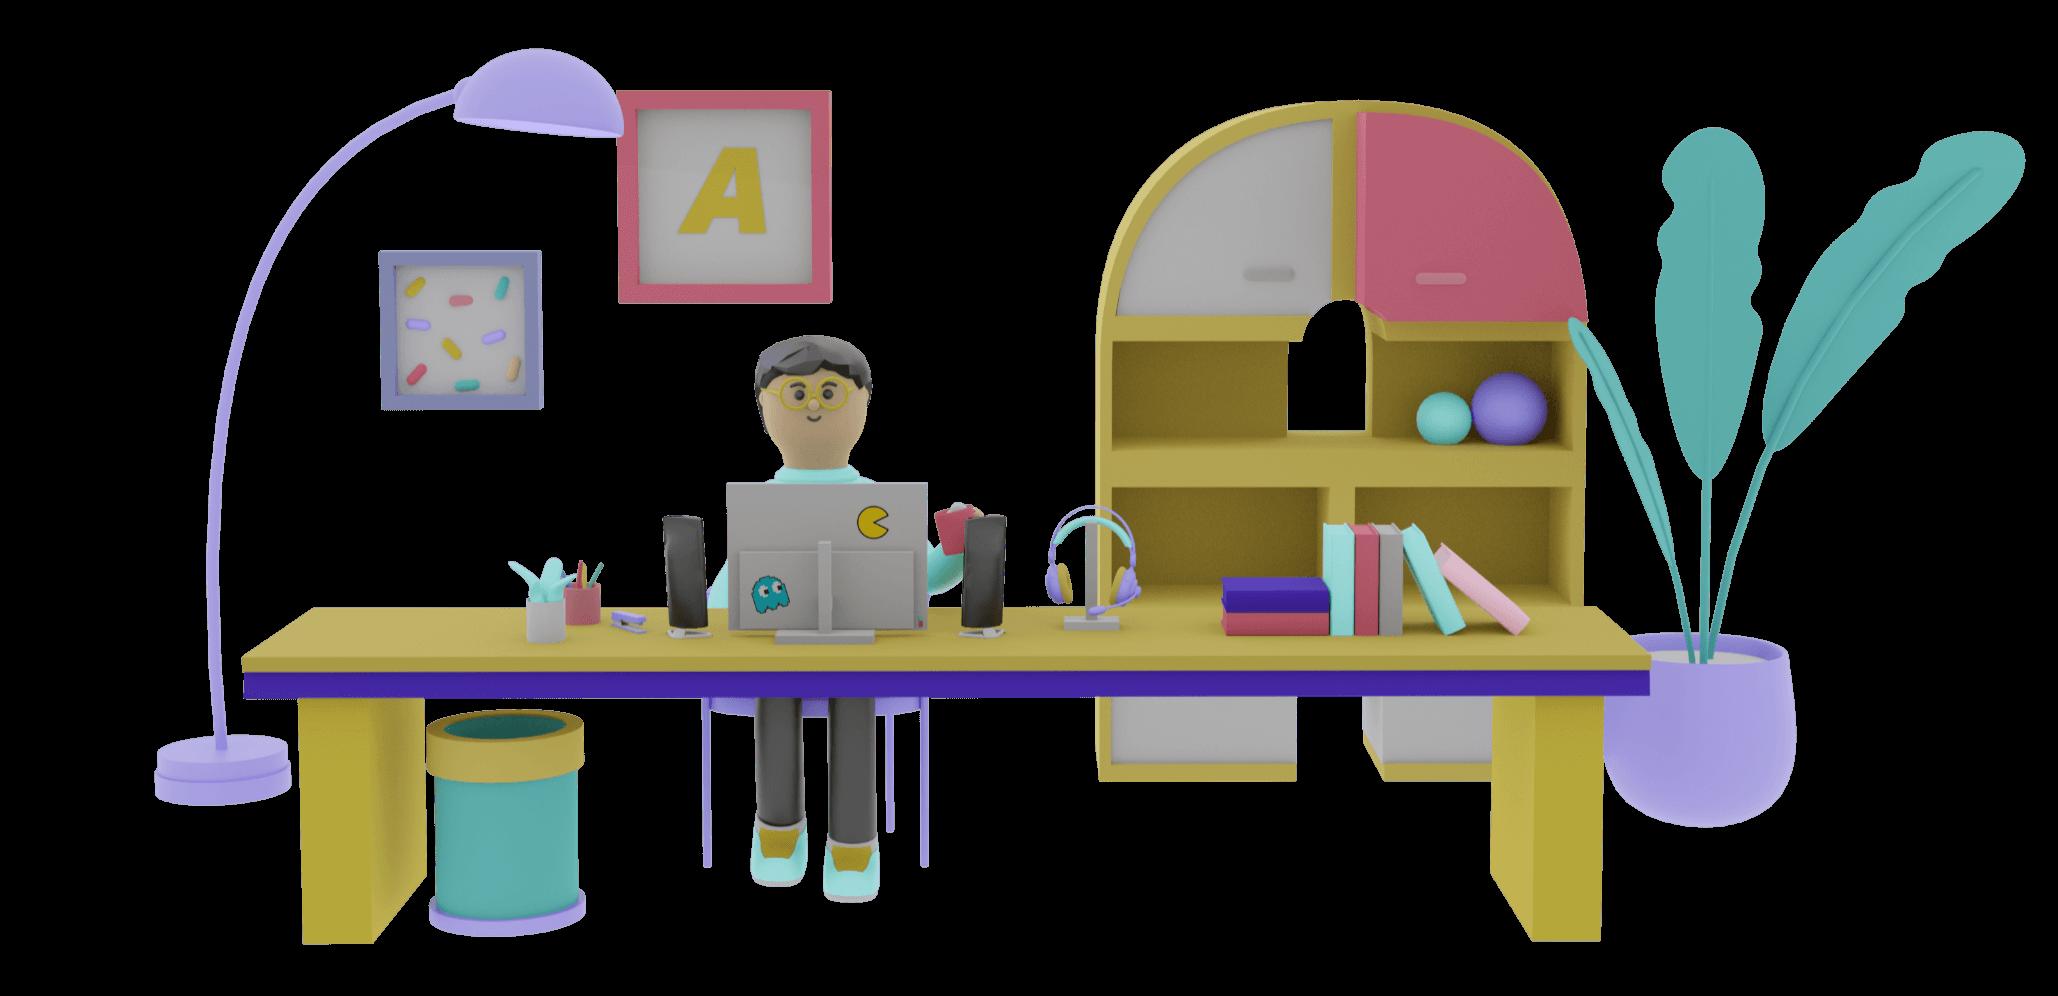 A 3D character representing me